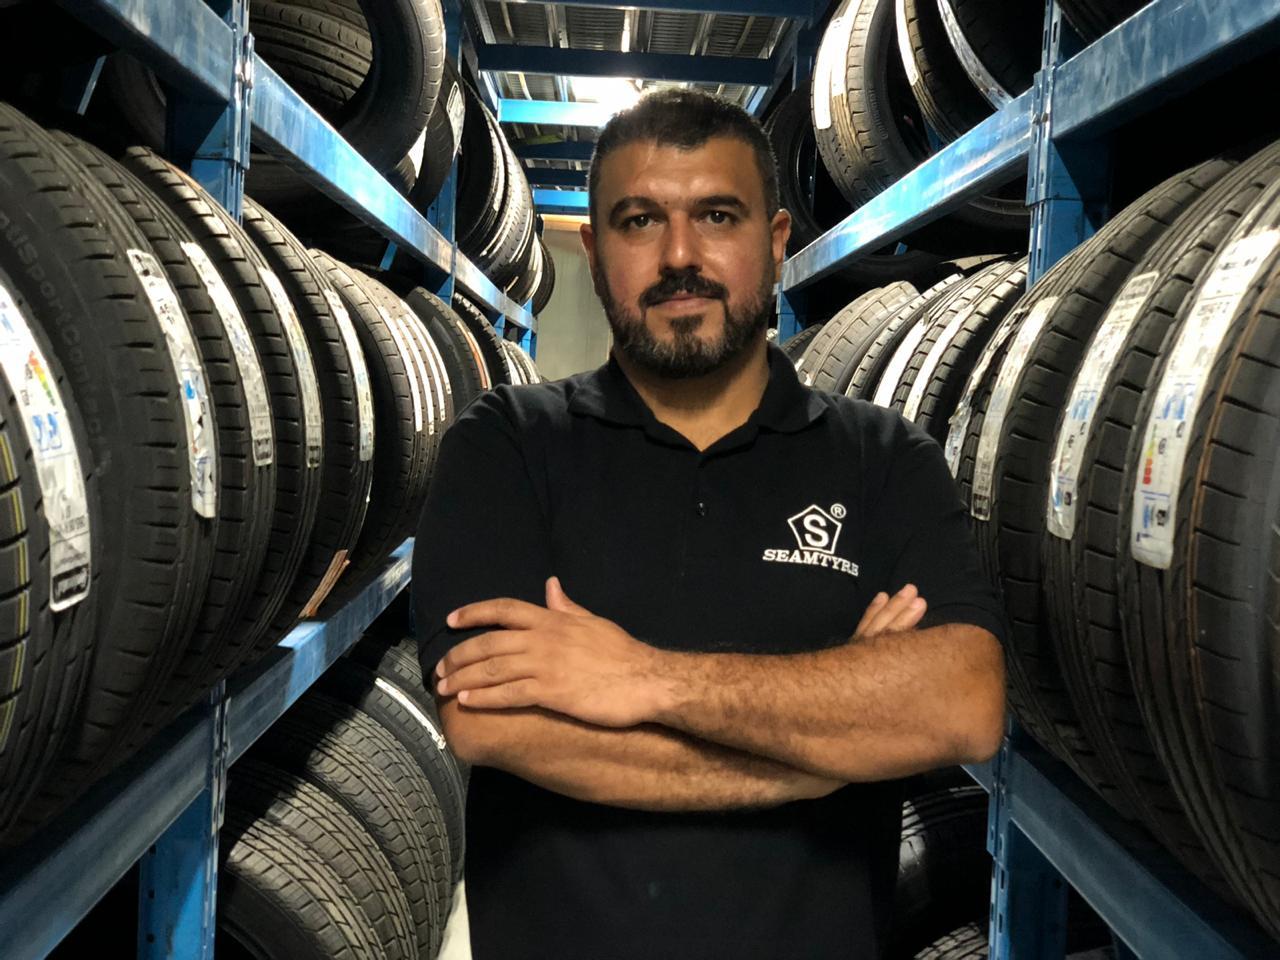 Interview with Ruhollah Rezaei - Al Nouf Tyres (SEAM Tyres)